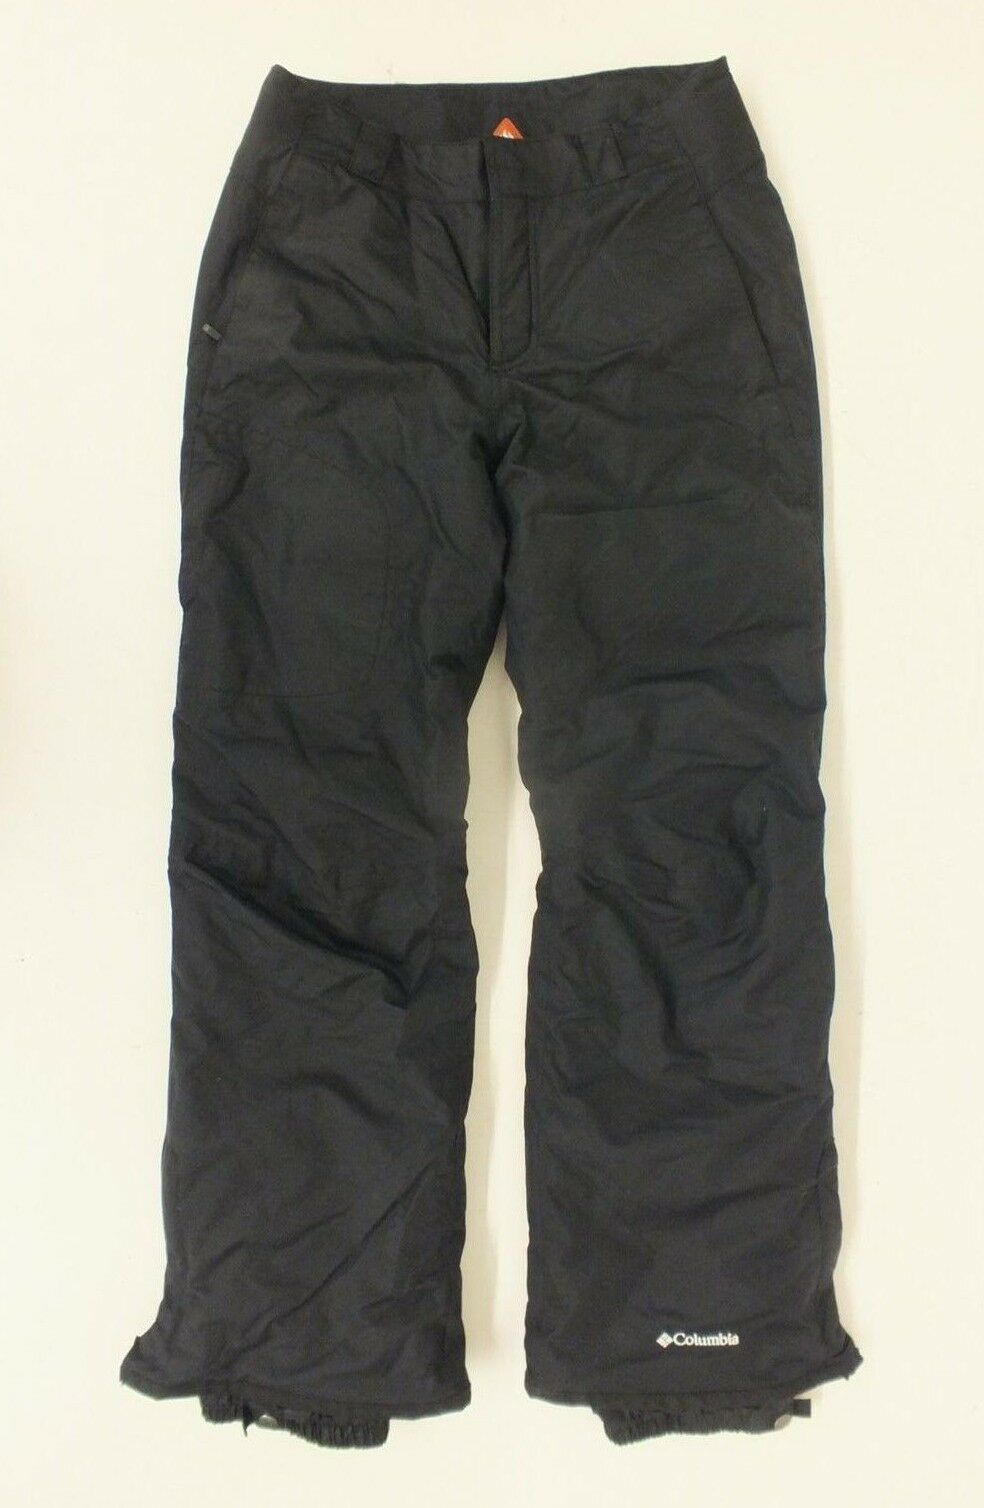 Columbia Omni-Tech Waterproof Breathable Omni-Heat Insulated Ski Snow Pants Sml